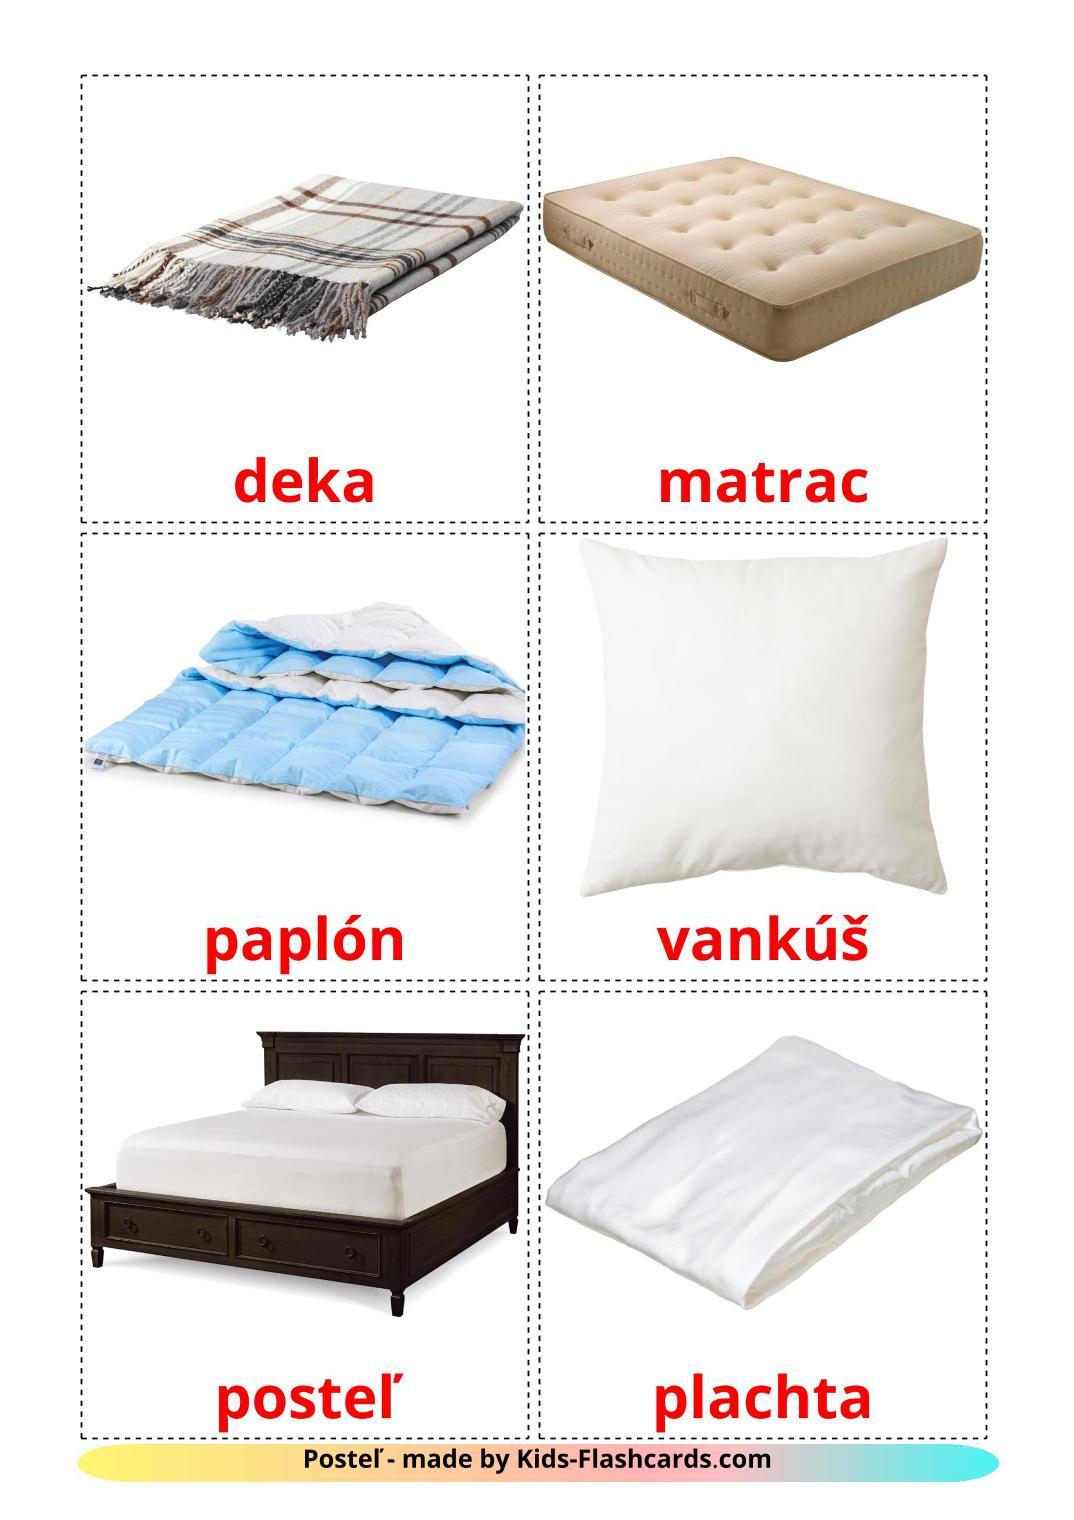 Bed - 15 Free Printable slovak Flashcards